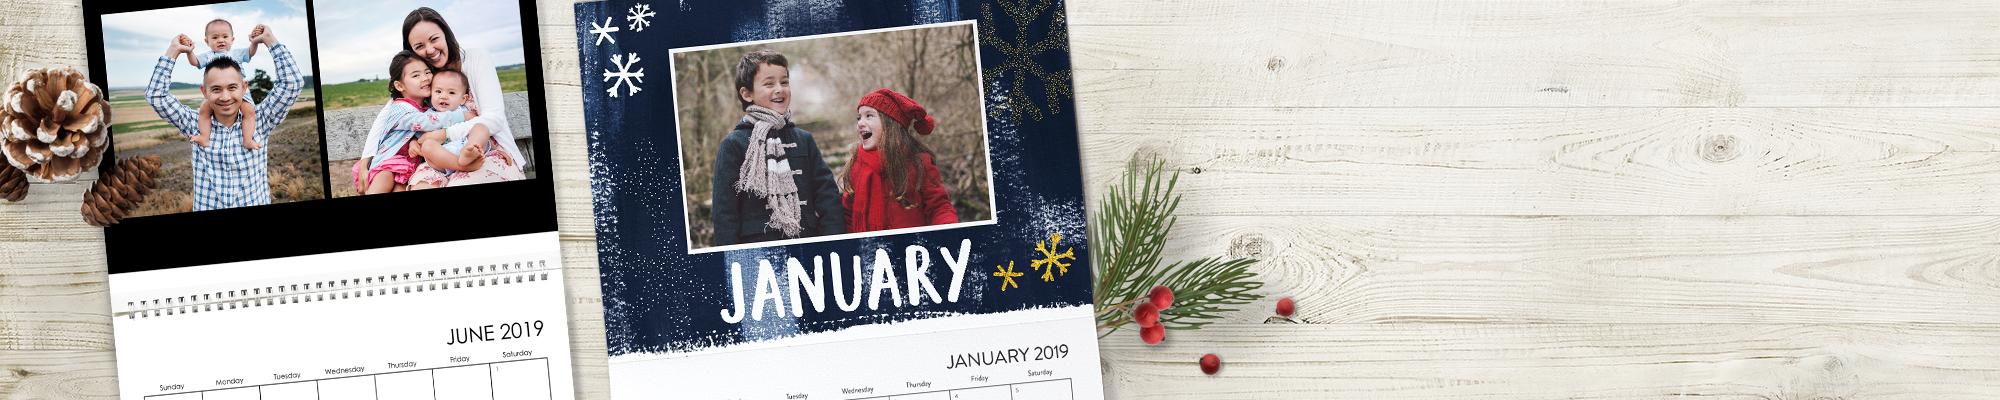 2019 Photo Calendars